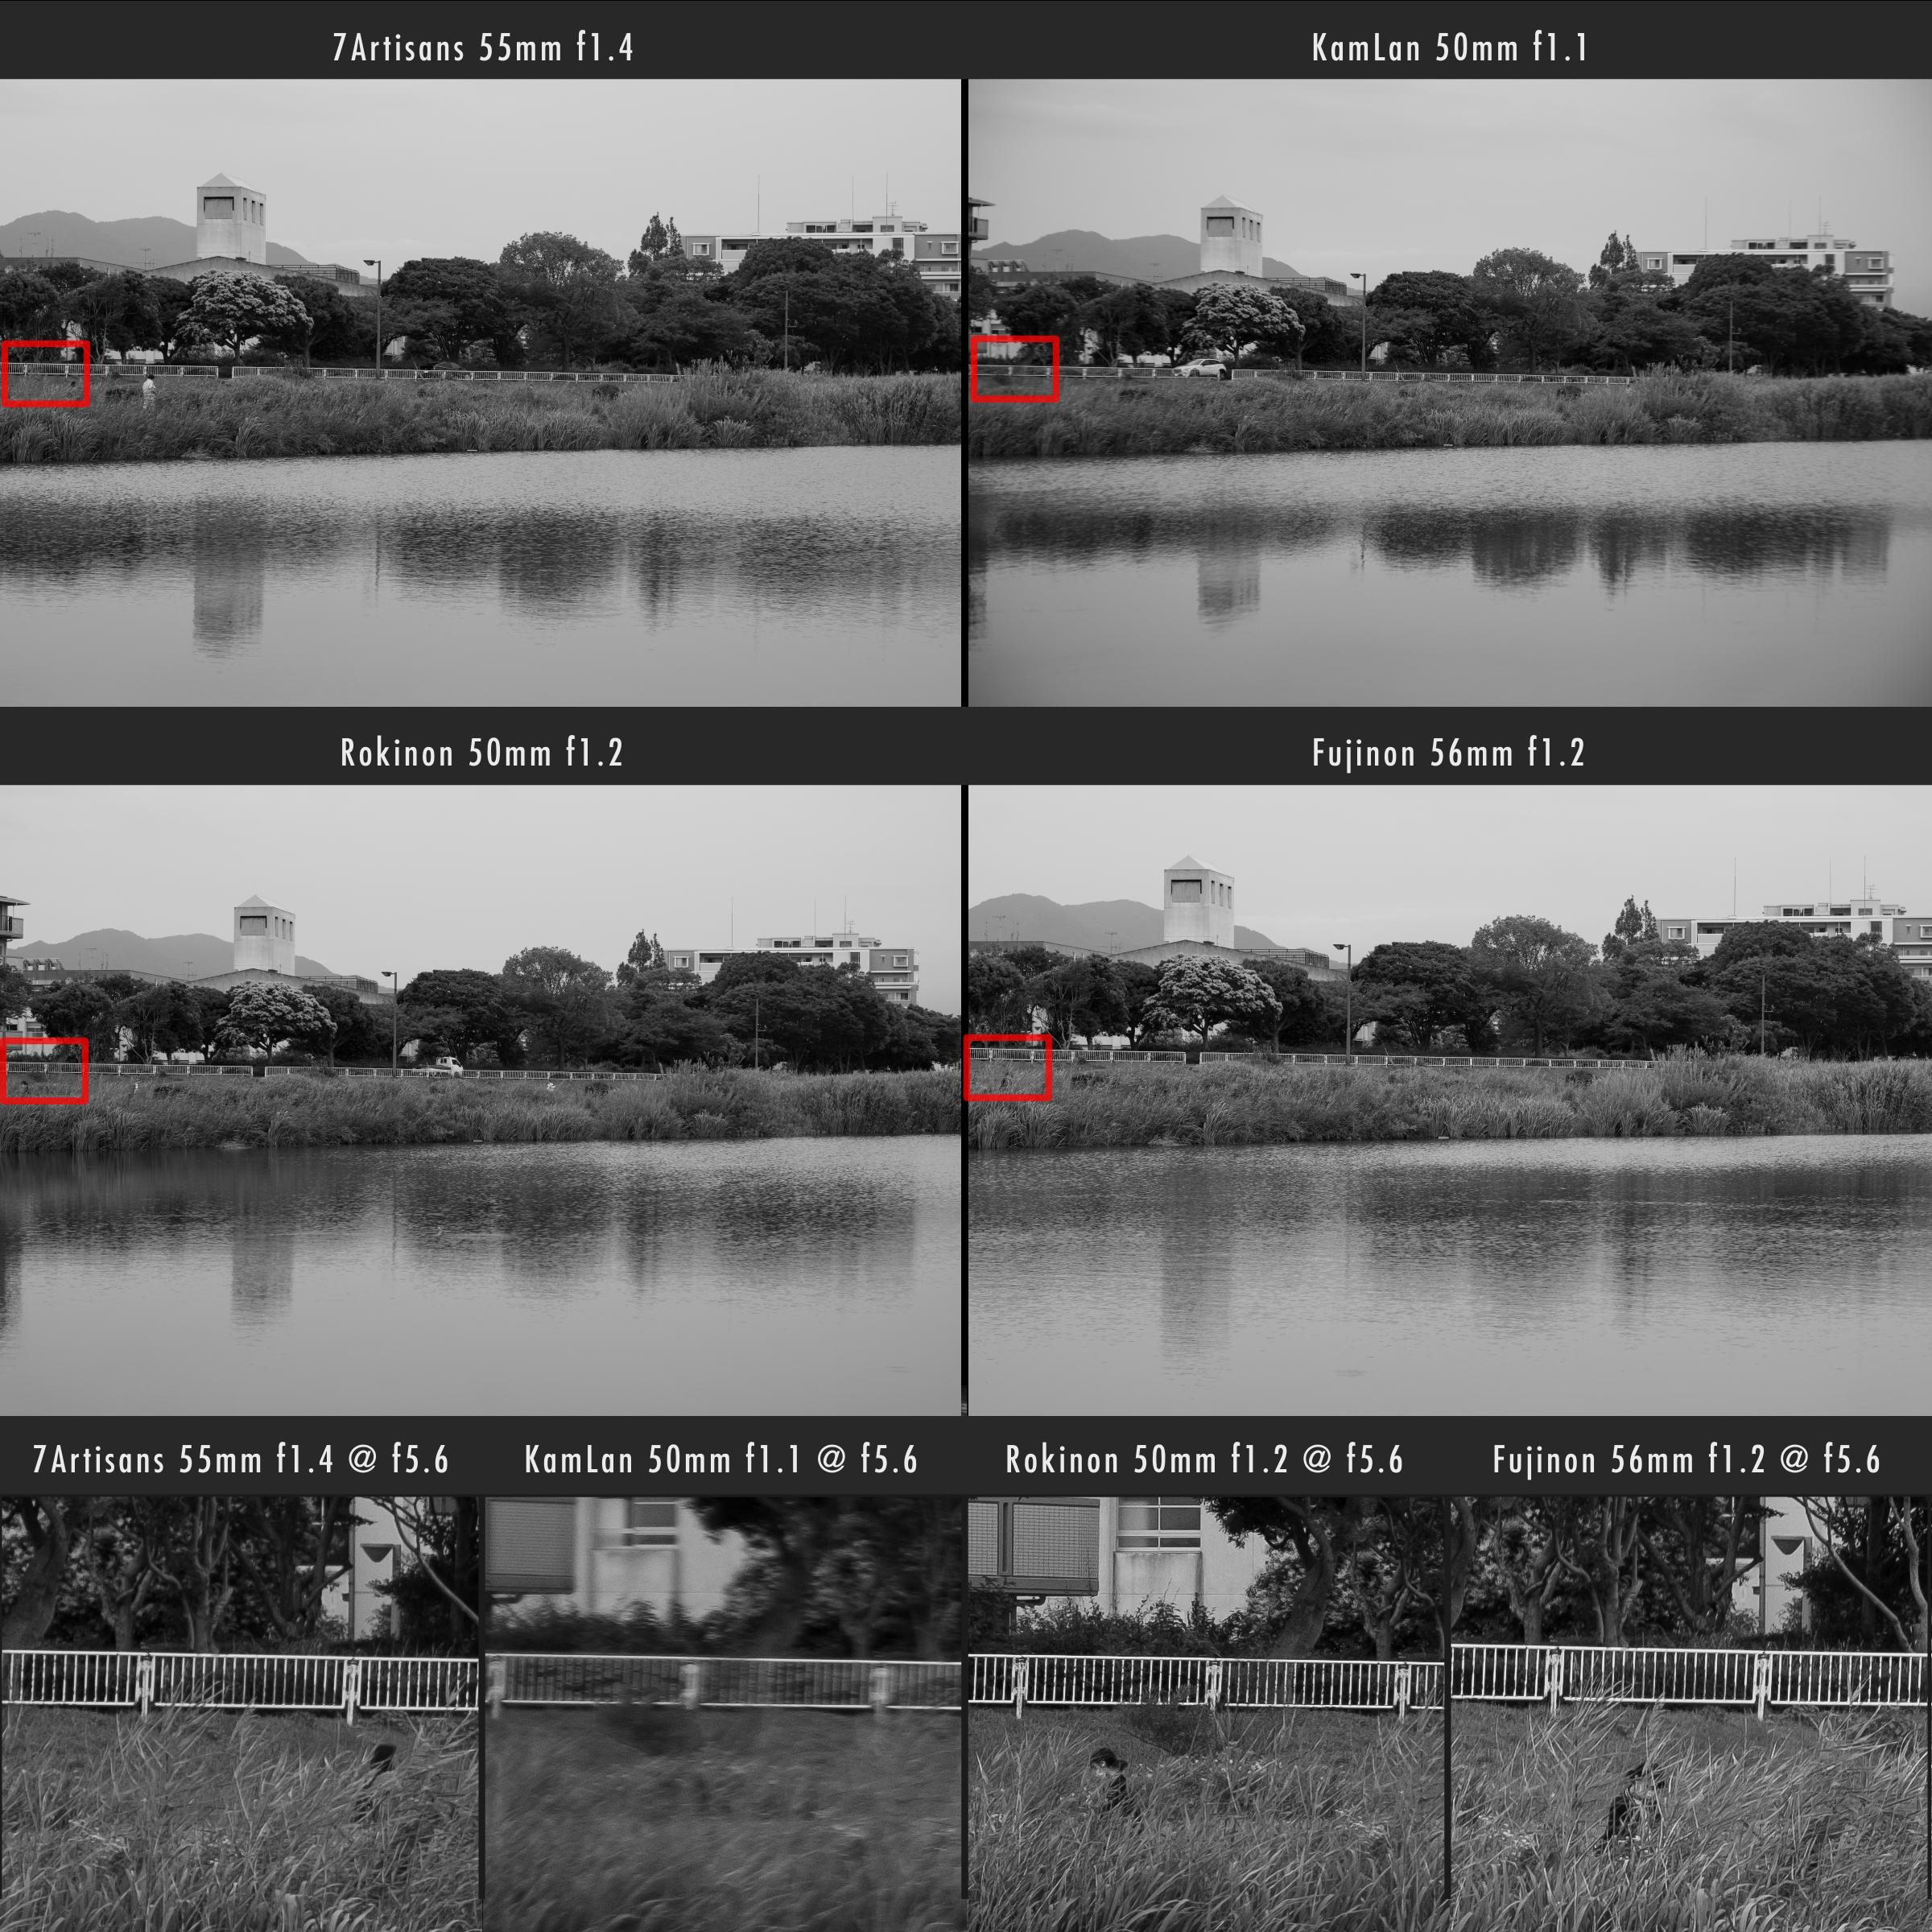 Kamlan 50mm f1.1 vs 7Artisans 55mm f1.4 vs Rokinon 50mm f1.2 Edge Sharpness Comparison f5.6